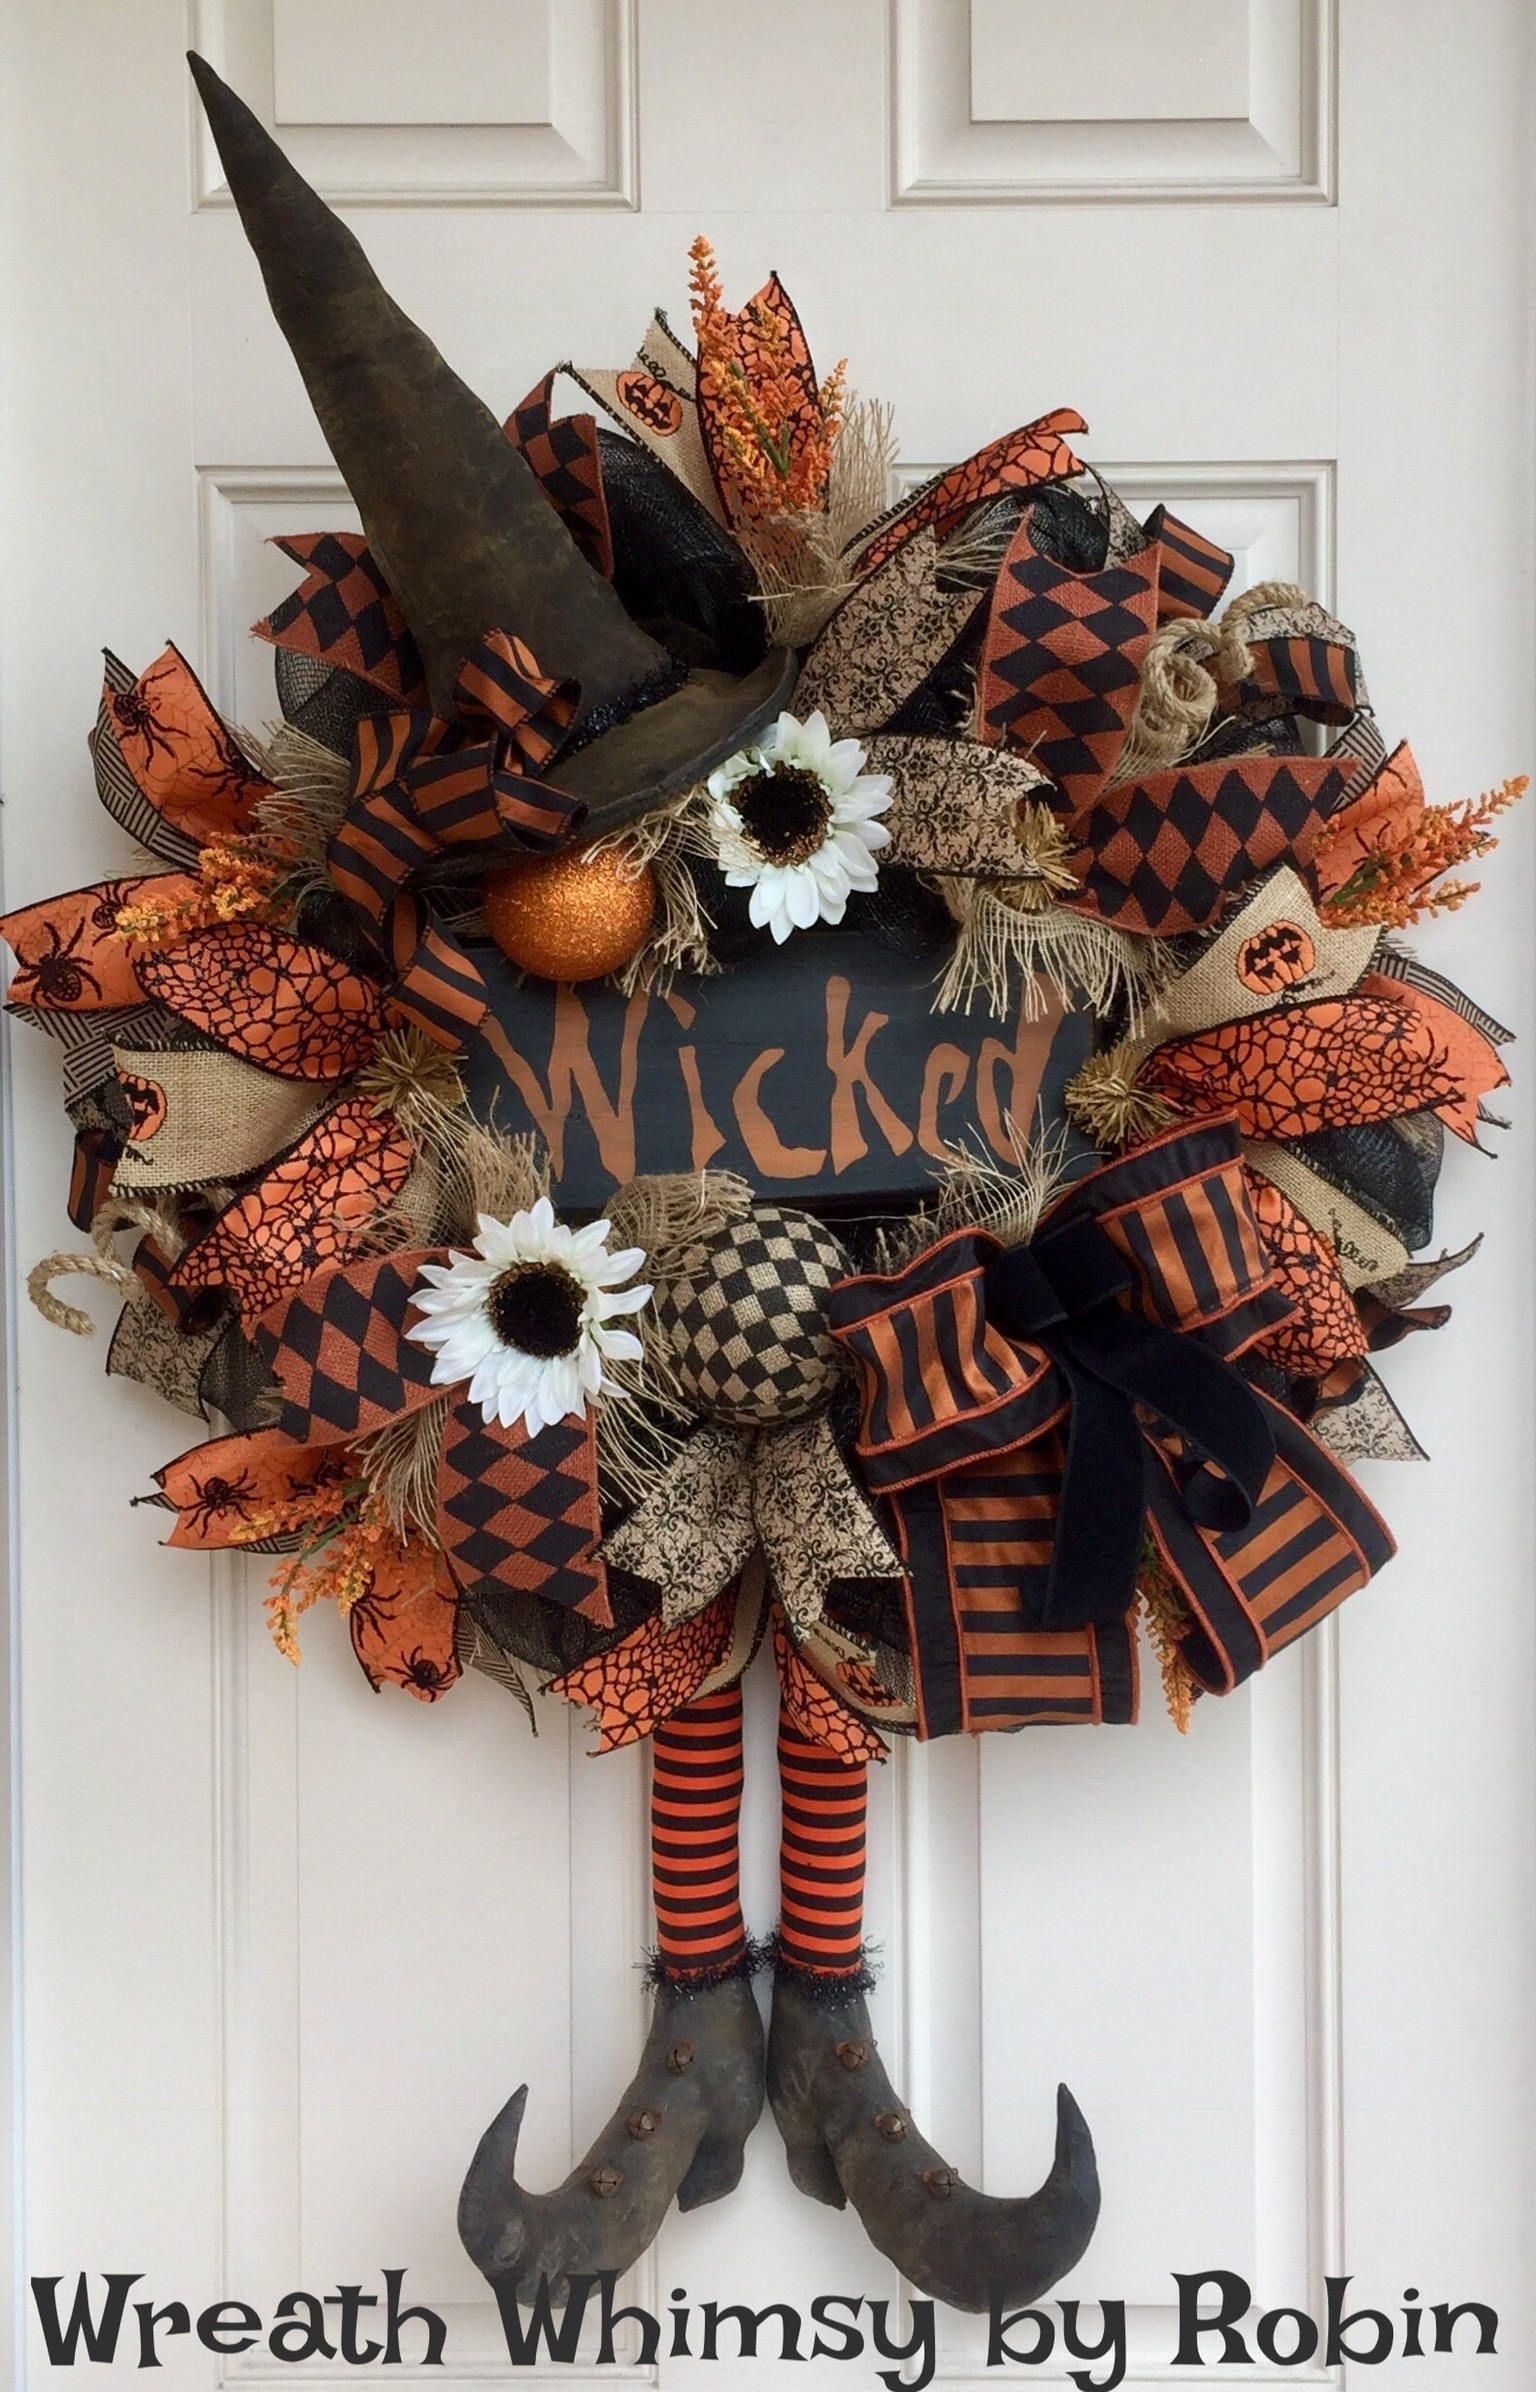 Halloween burlap mesh rustic witch wreath with primitive boots halloween burlap mesh rustic witch wreath with primitive boots and hat fall wreath front door wreath xl halloween wreath folk art rubansaba